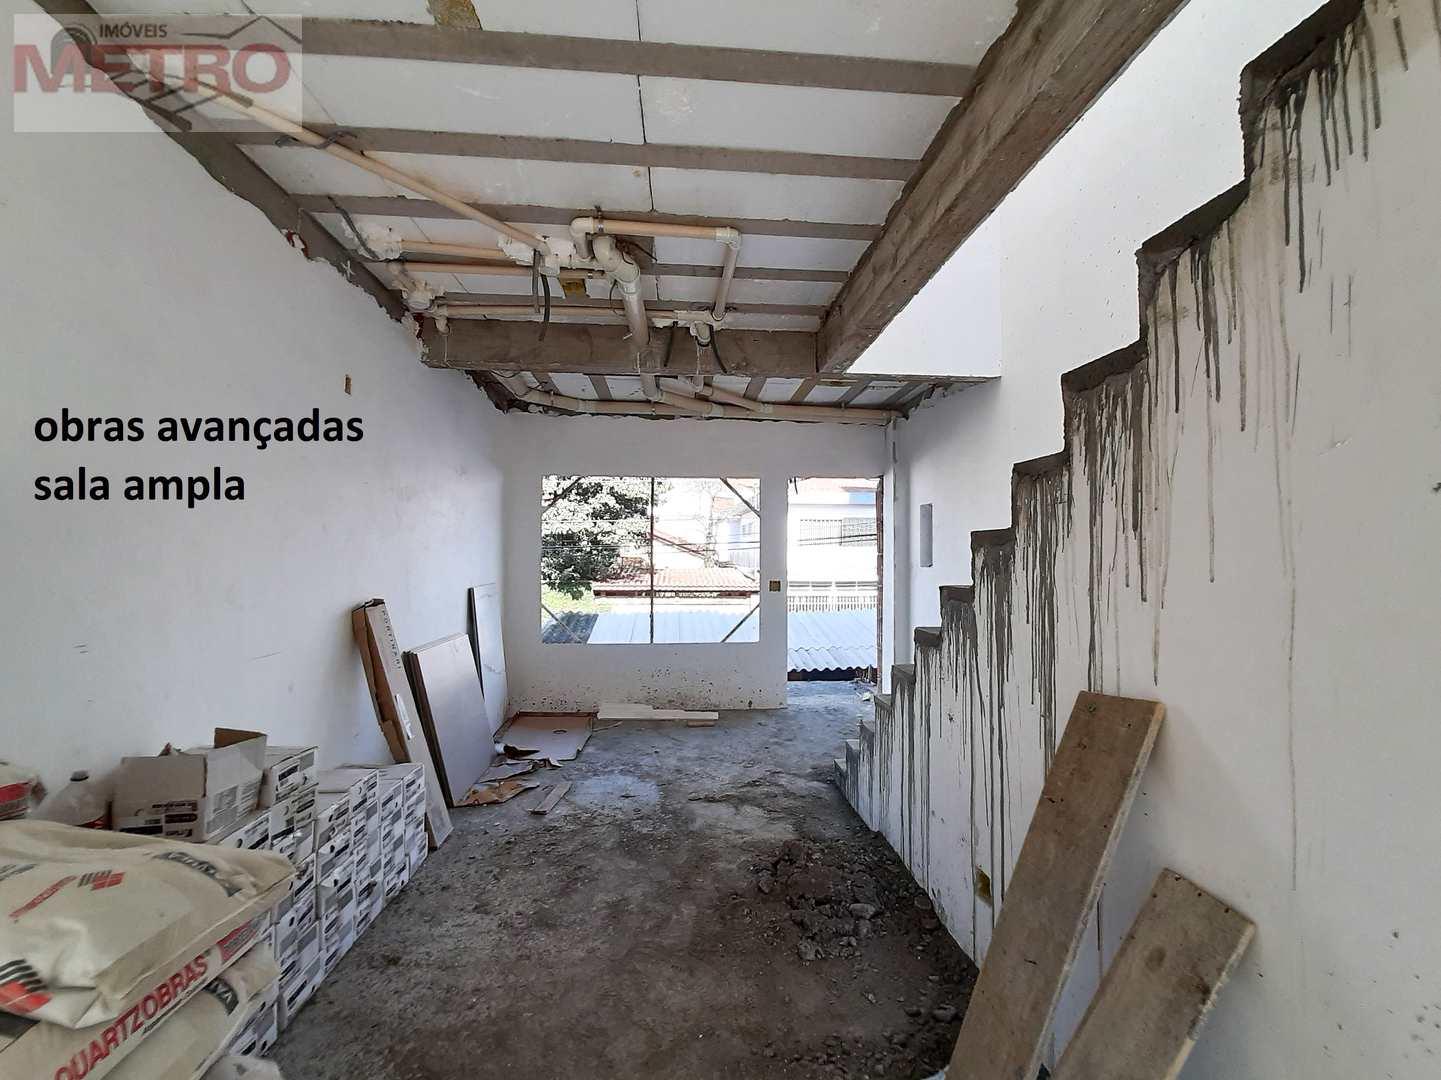 Sobrado com 3 dorms, Jardim Prudência, São Paulo - R$ 570 mil, Cod: 91173